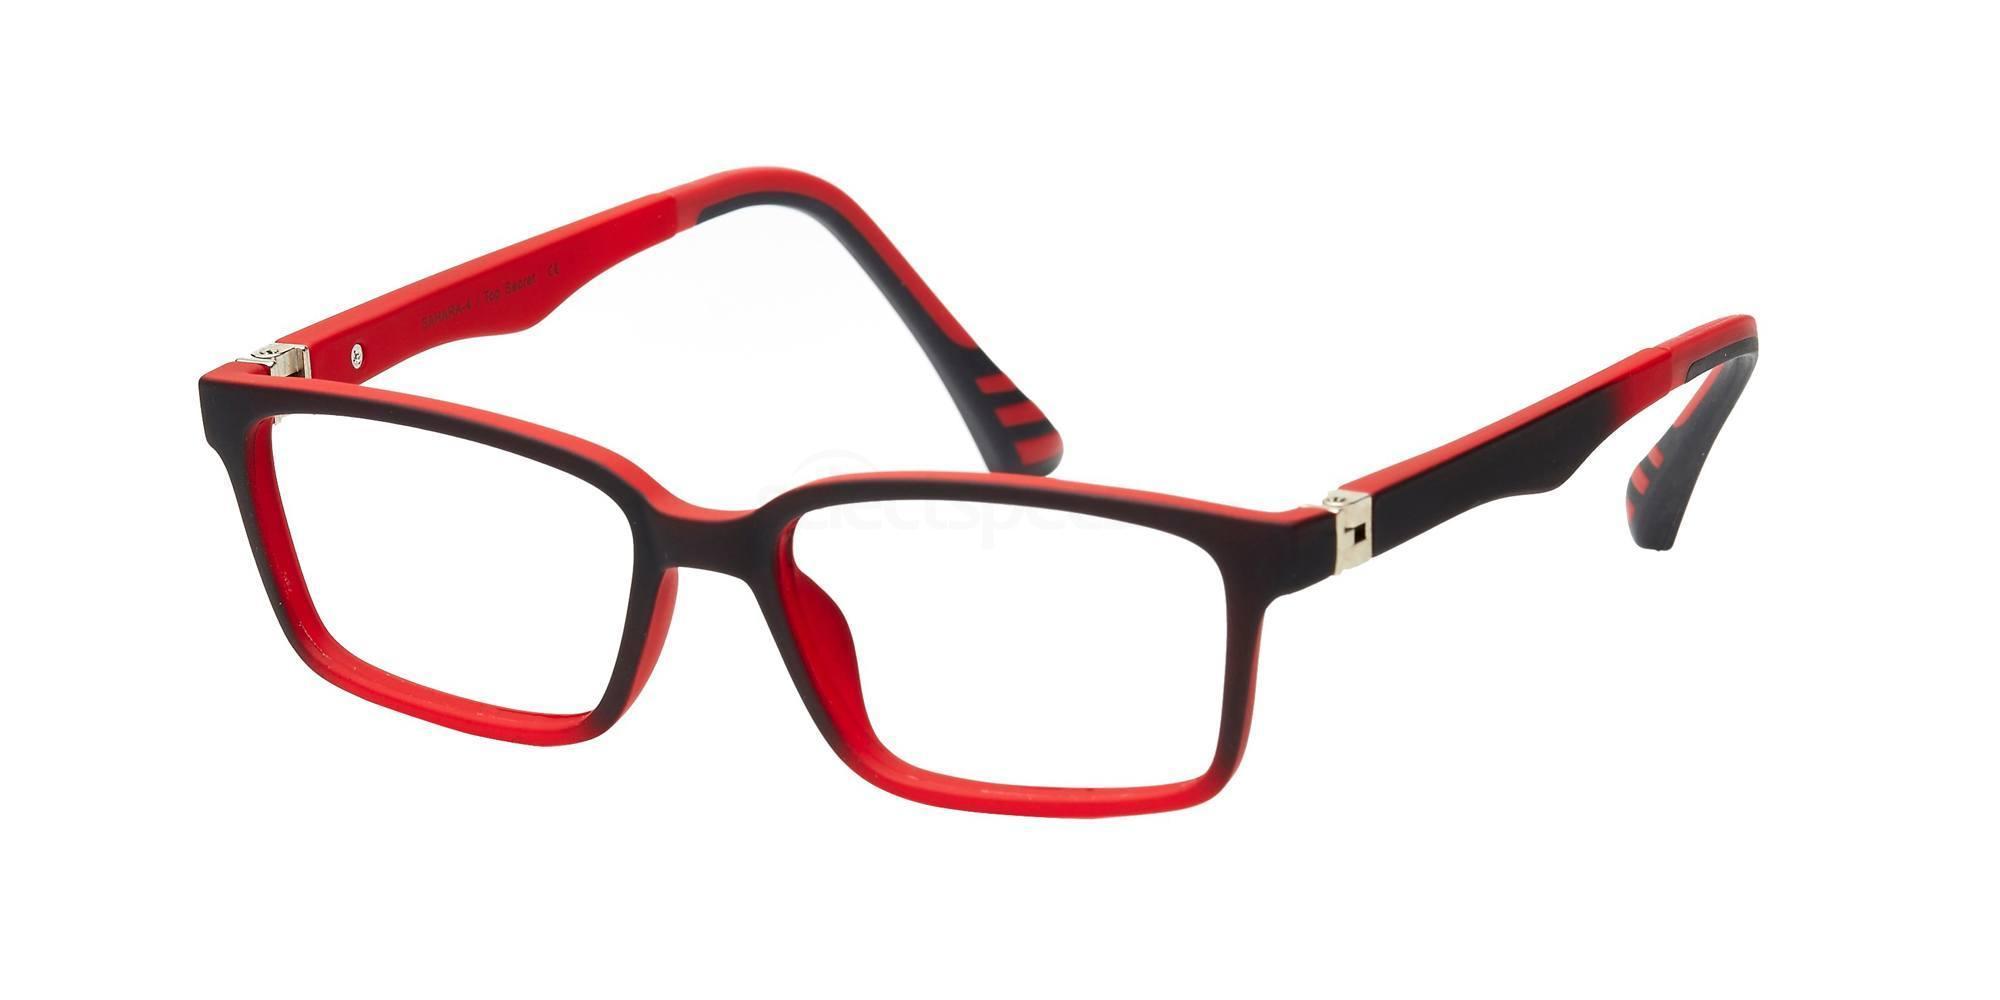 C2 SAHARA4 Glasses, Top Secret KIDS